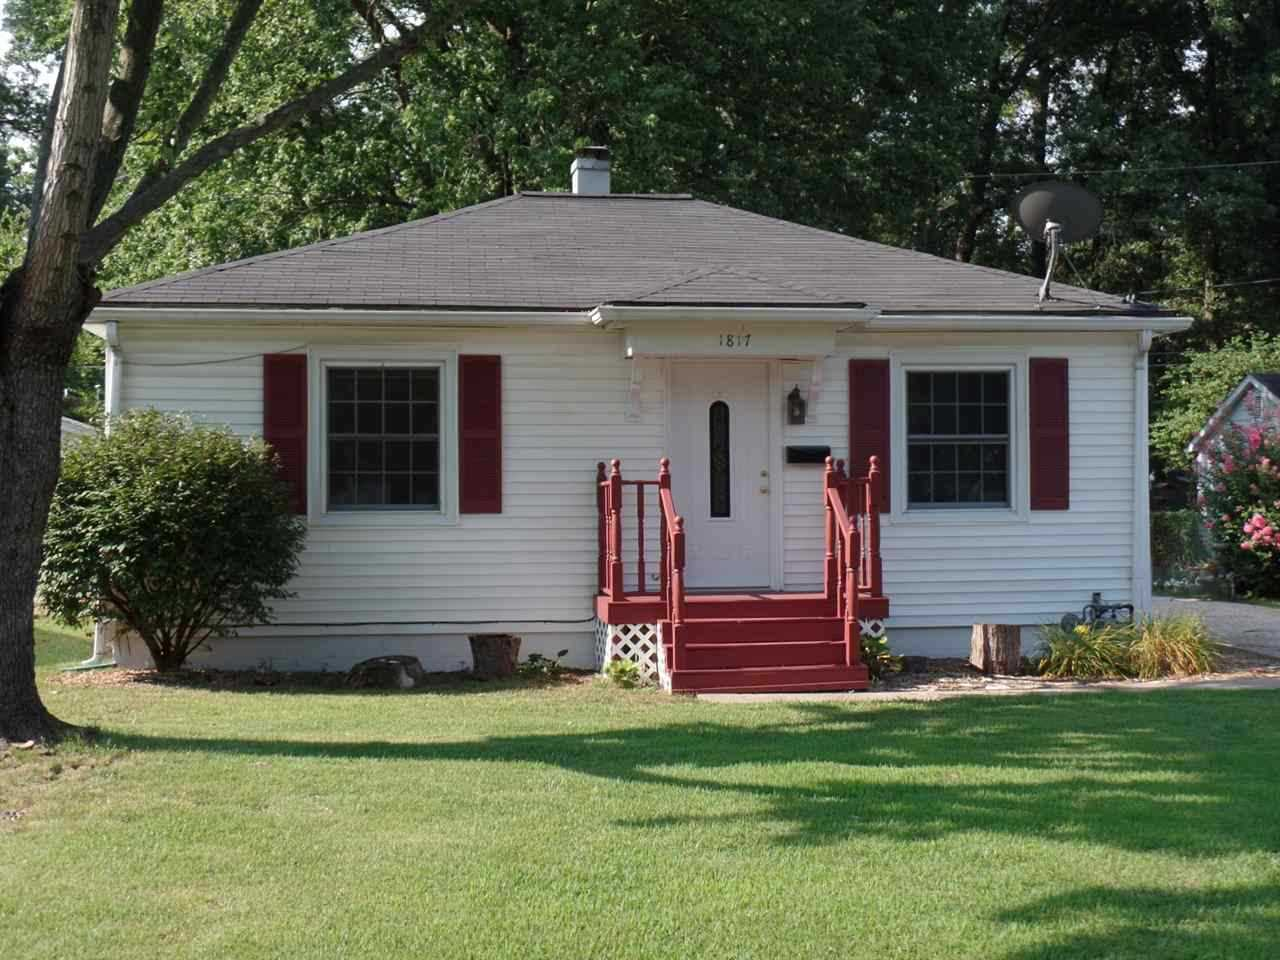 1817 Cass Ave Evansville, IN 47714 | MLS 201734574 Photo 1